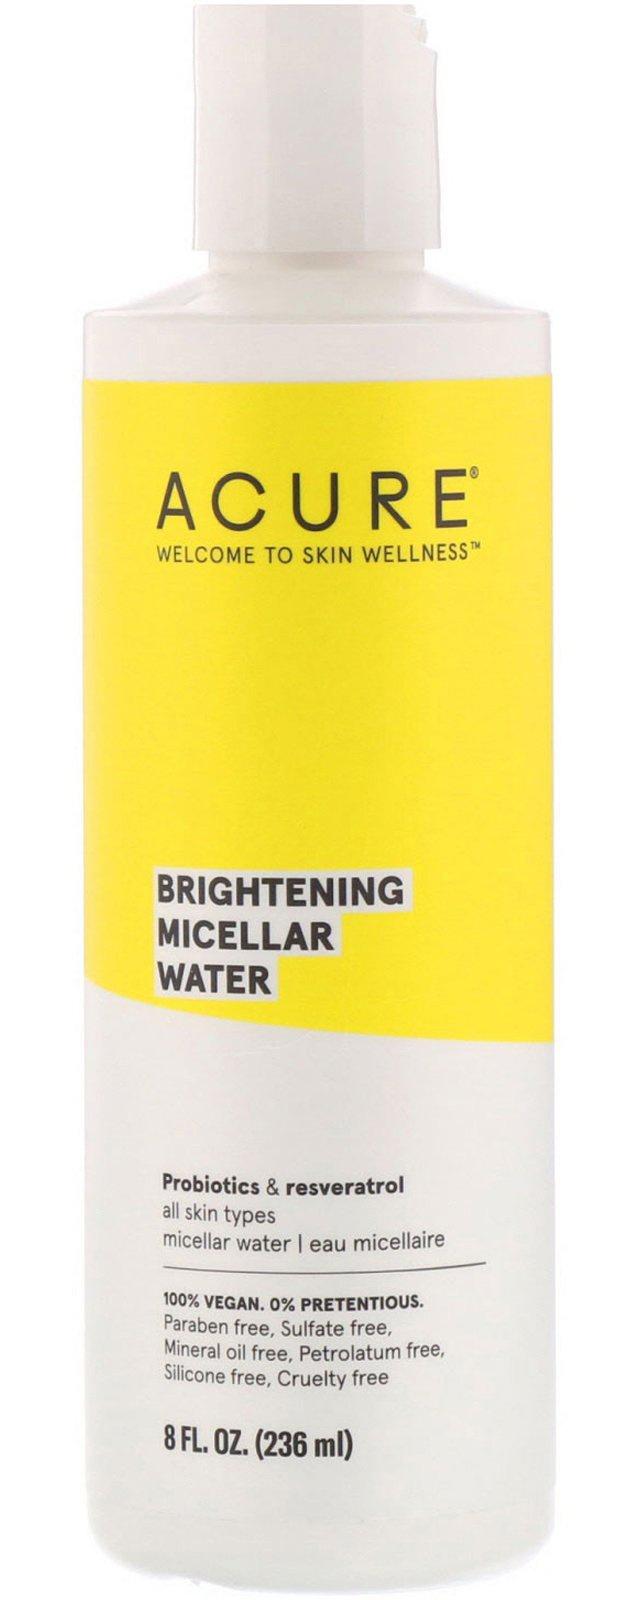 Acure Brightening Micellar Water